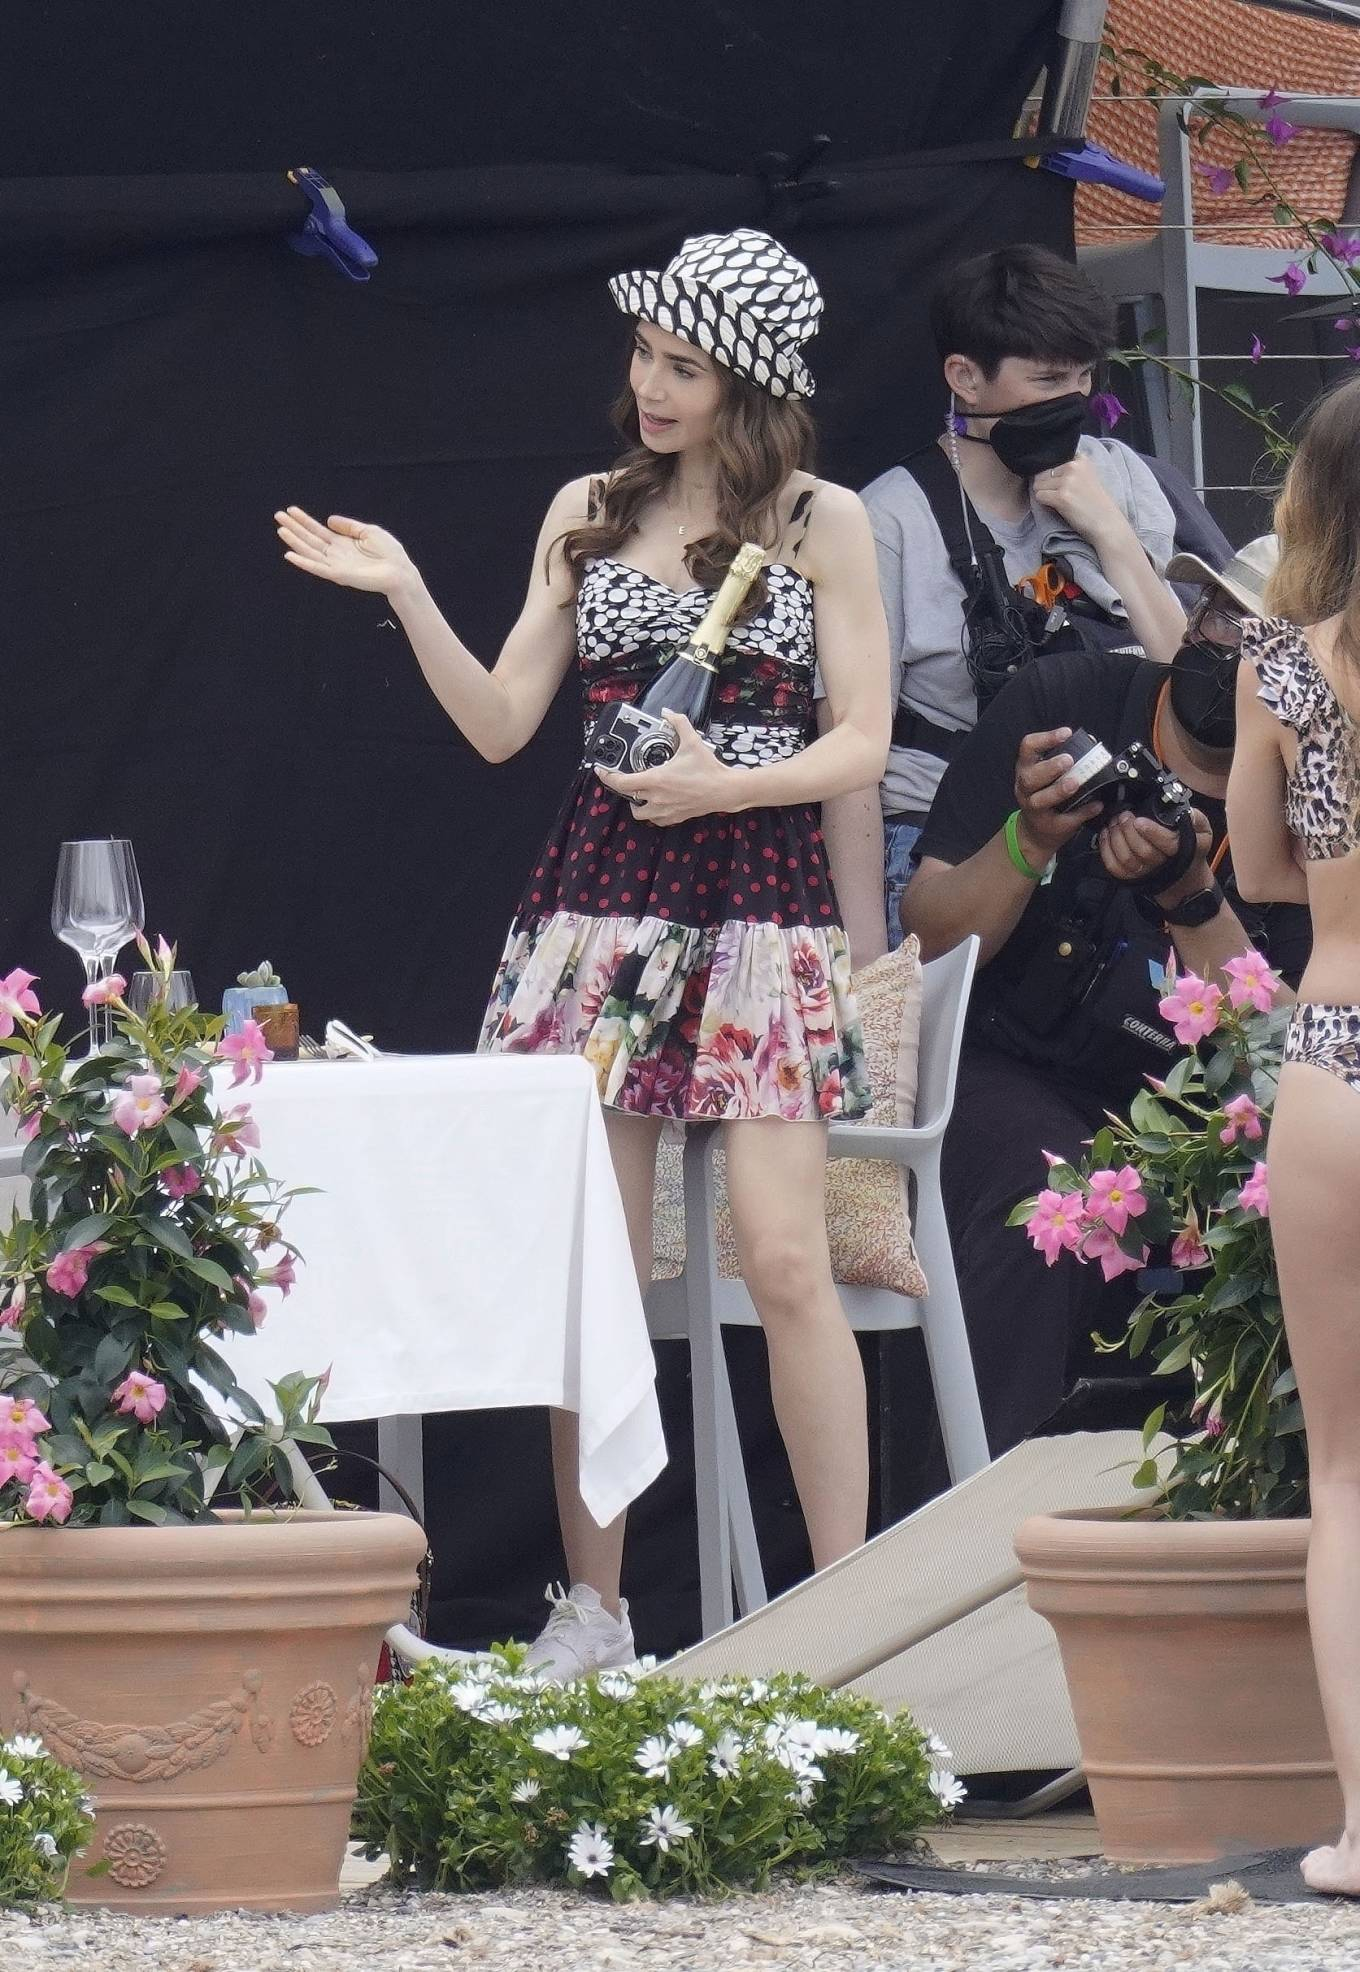 Lily Collins - on set filming for 'Emily In Paris' in Saint-Jean-Cap-Ferrat